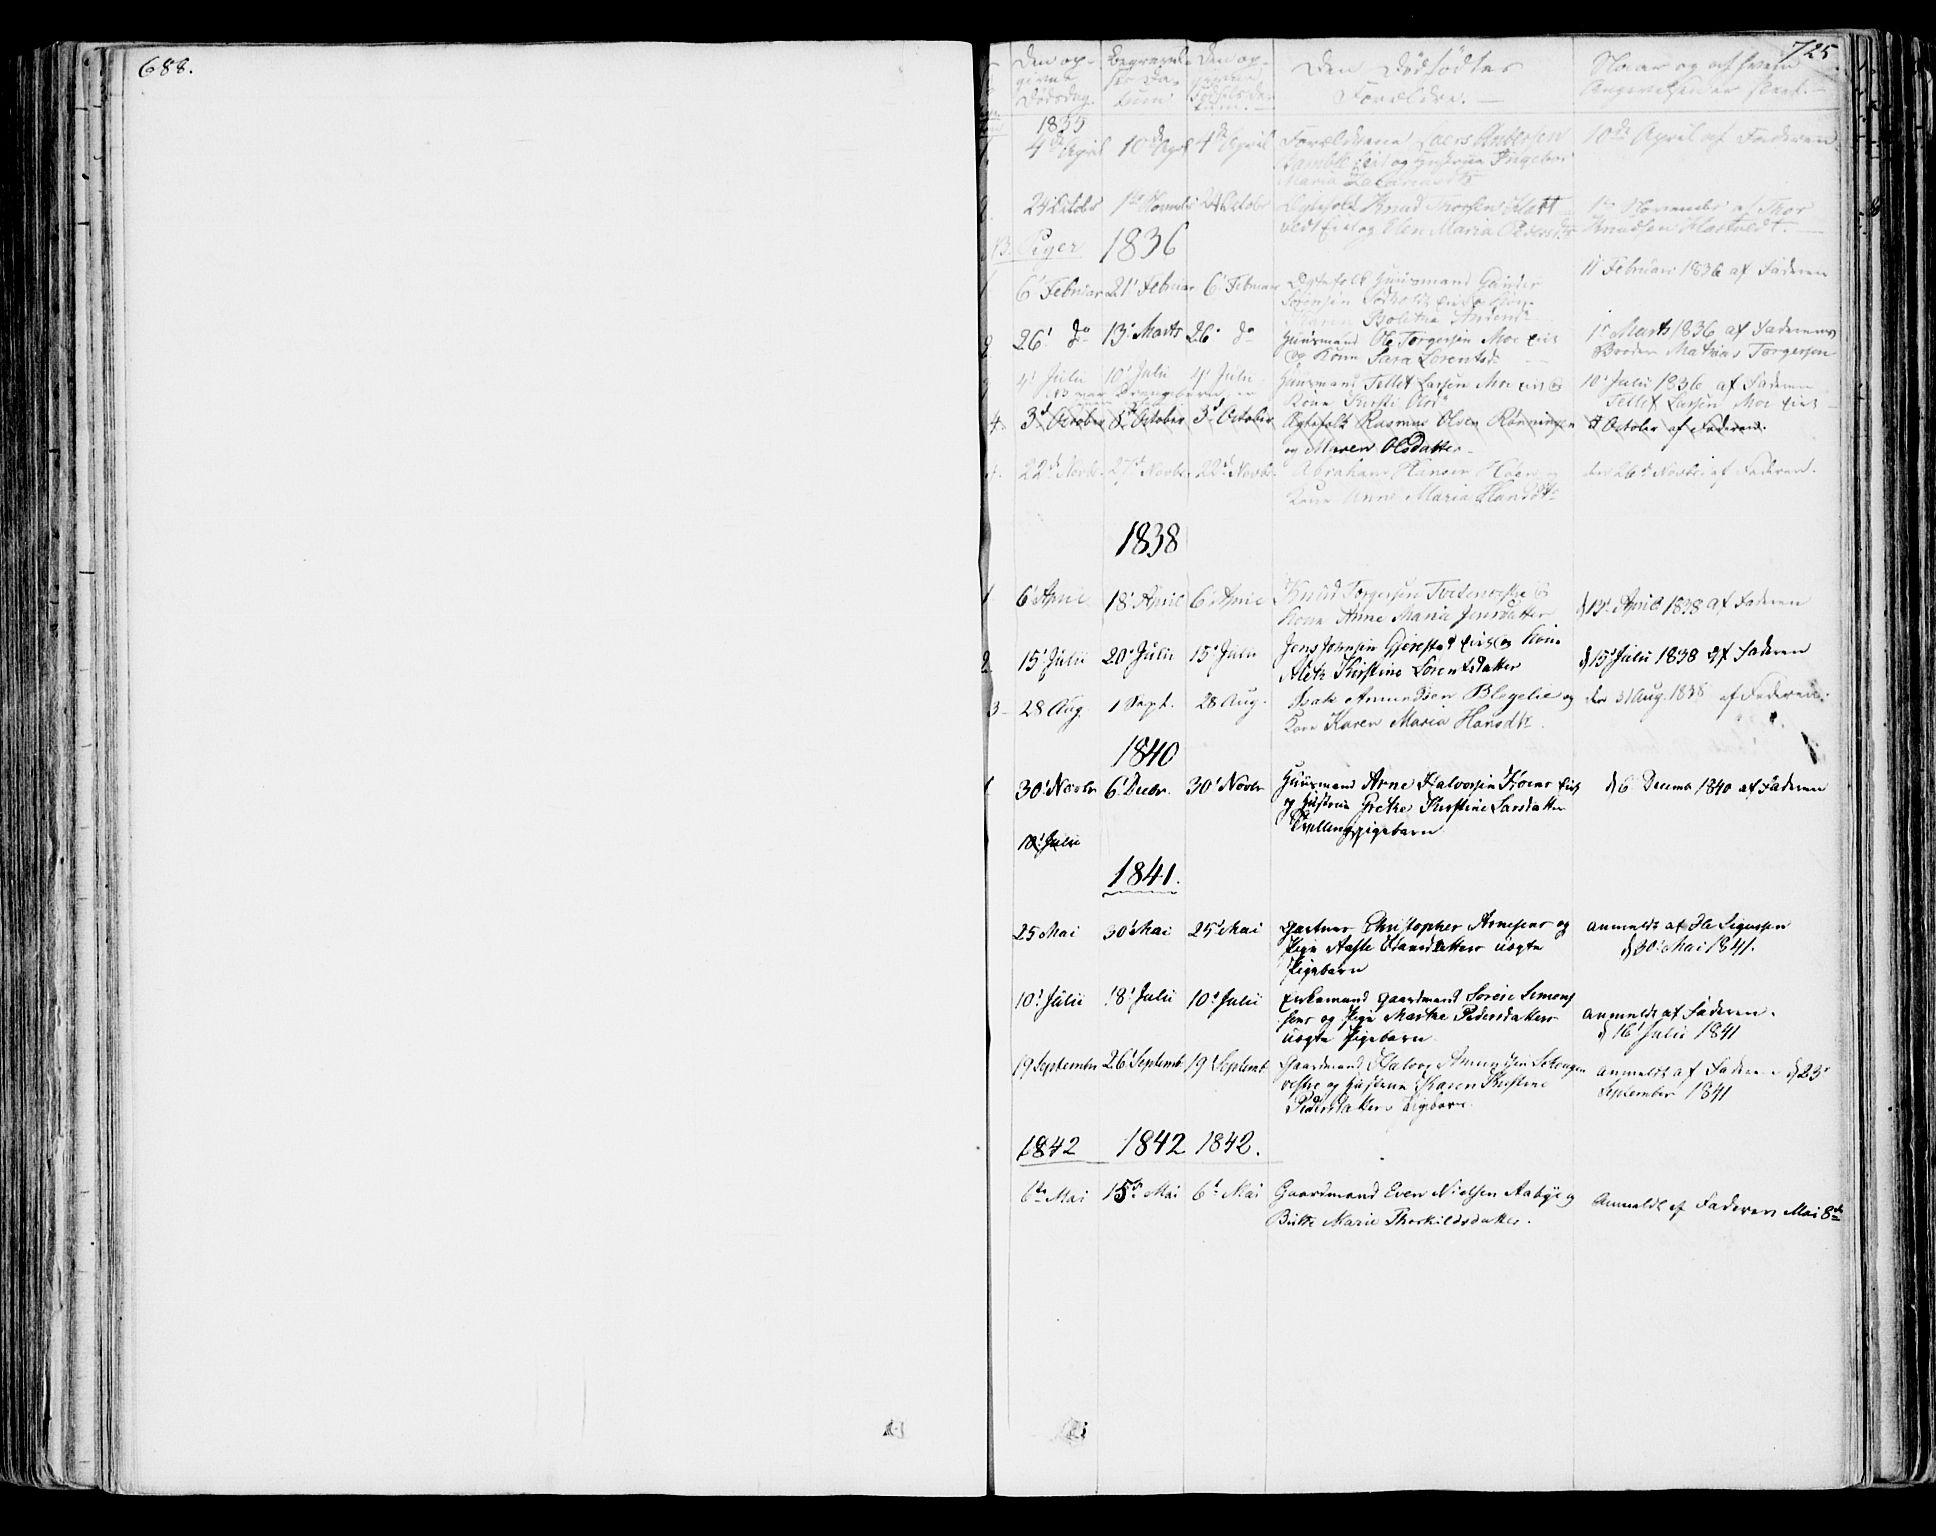 SAKO, Bamble kirkebøker, F/Fa/L0004: Ministerialbok nr. I 4, 1834-1853, s. 724-725